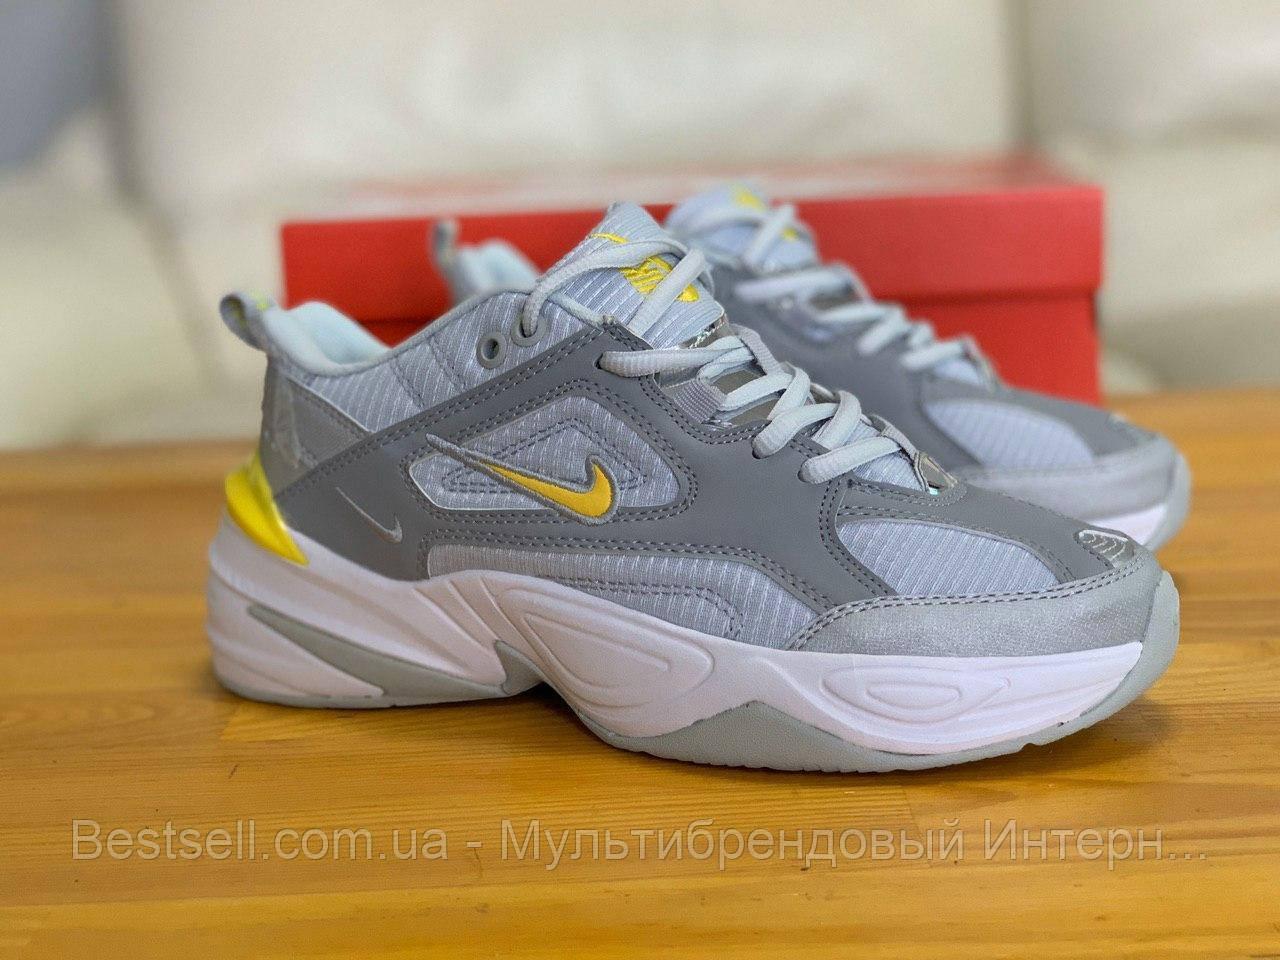 Кроссовки  натуральная кожа Nike M2K Tekno Найк М2К Текно (36,40)